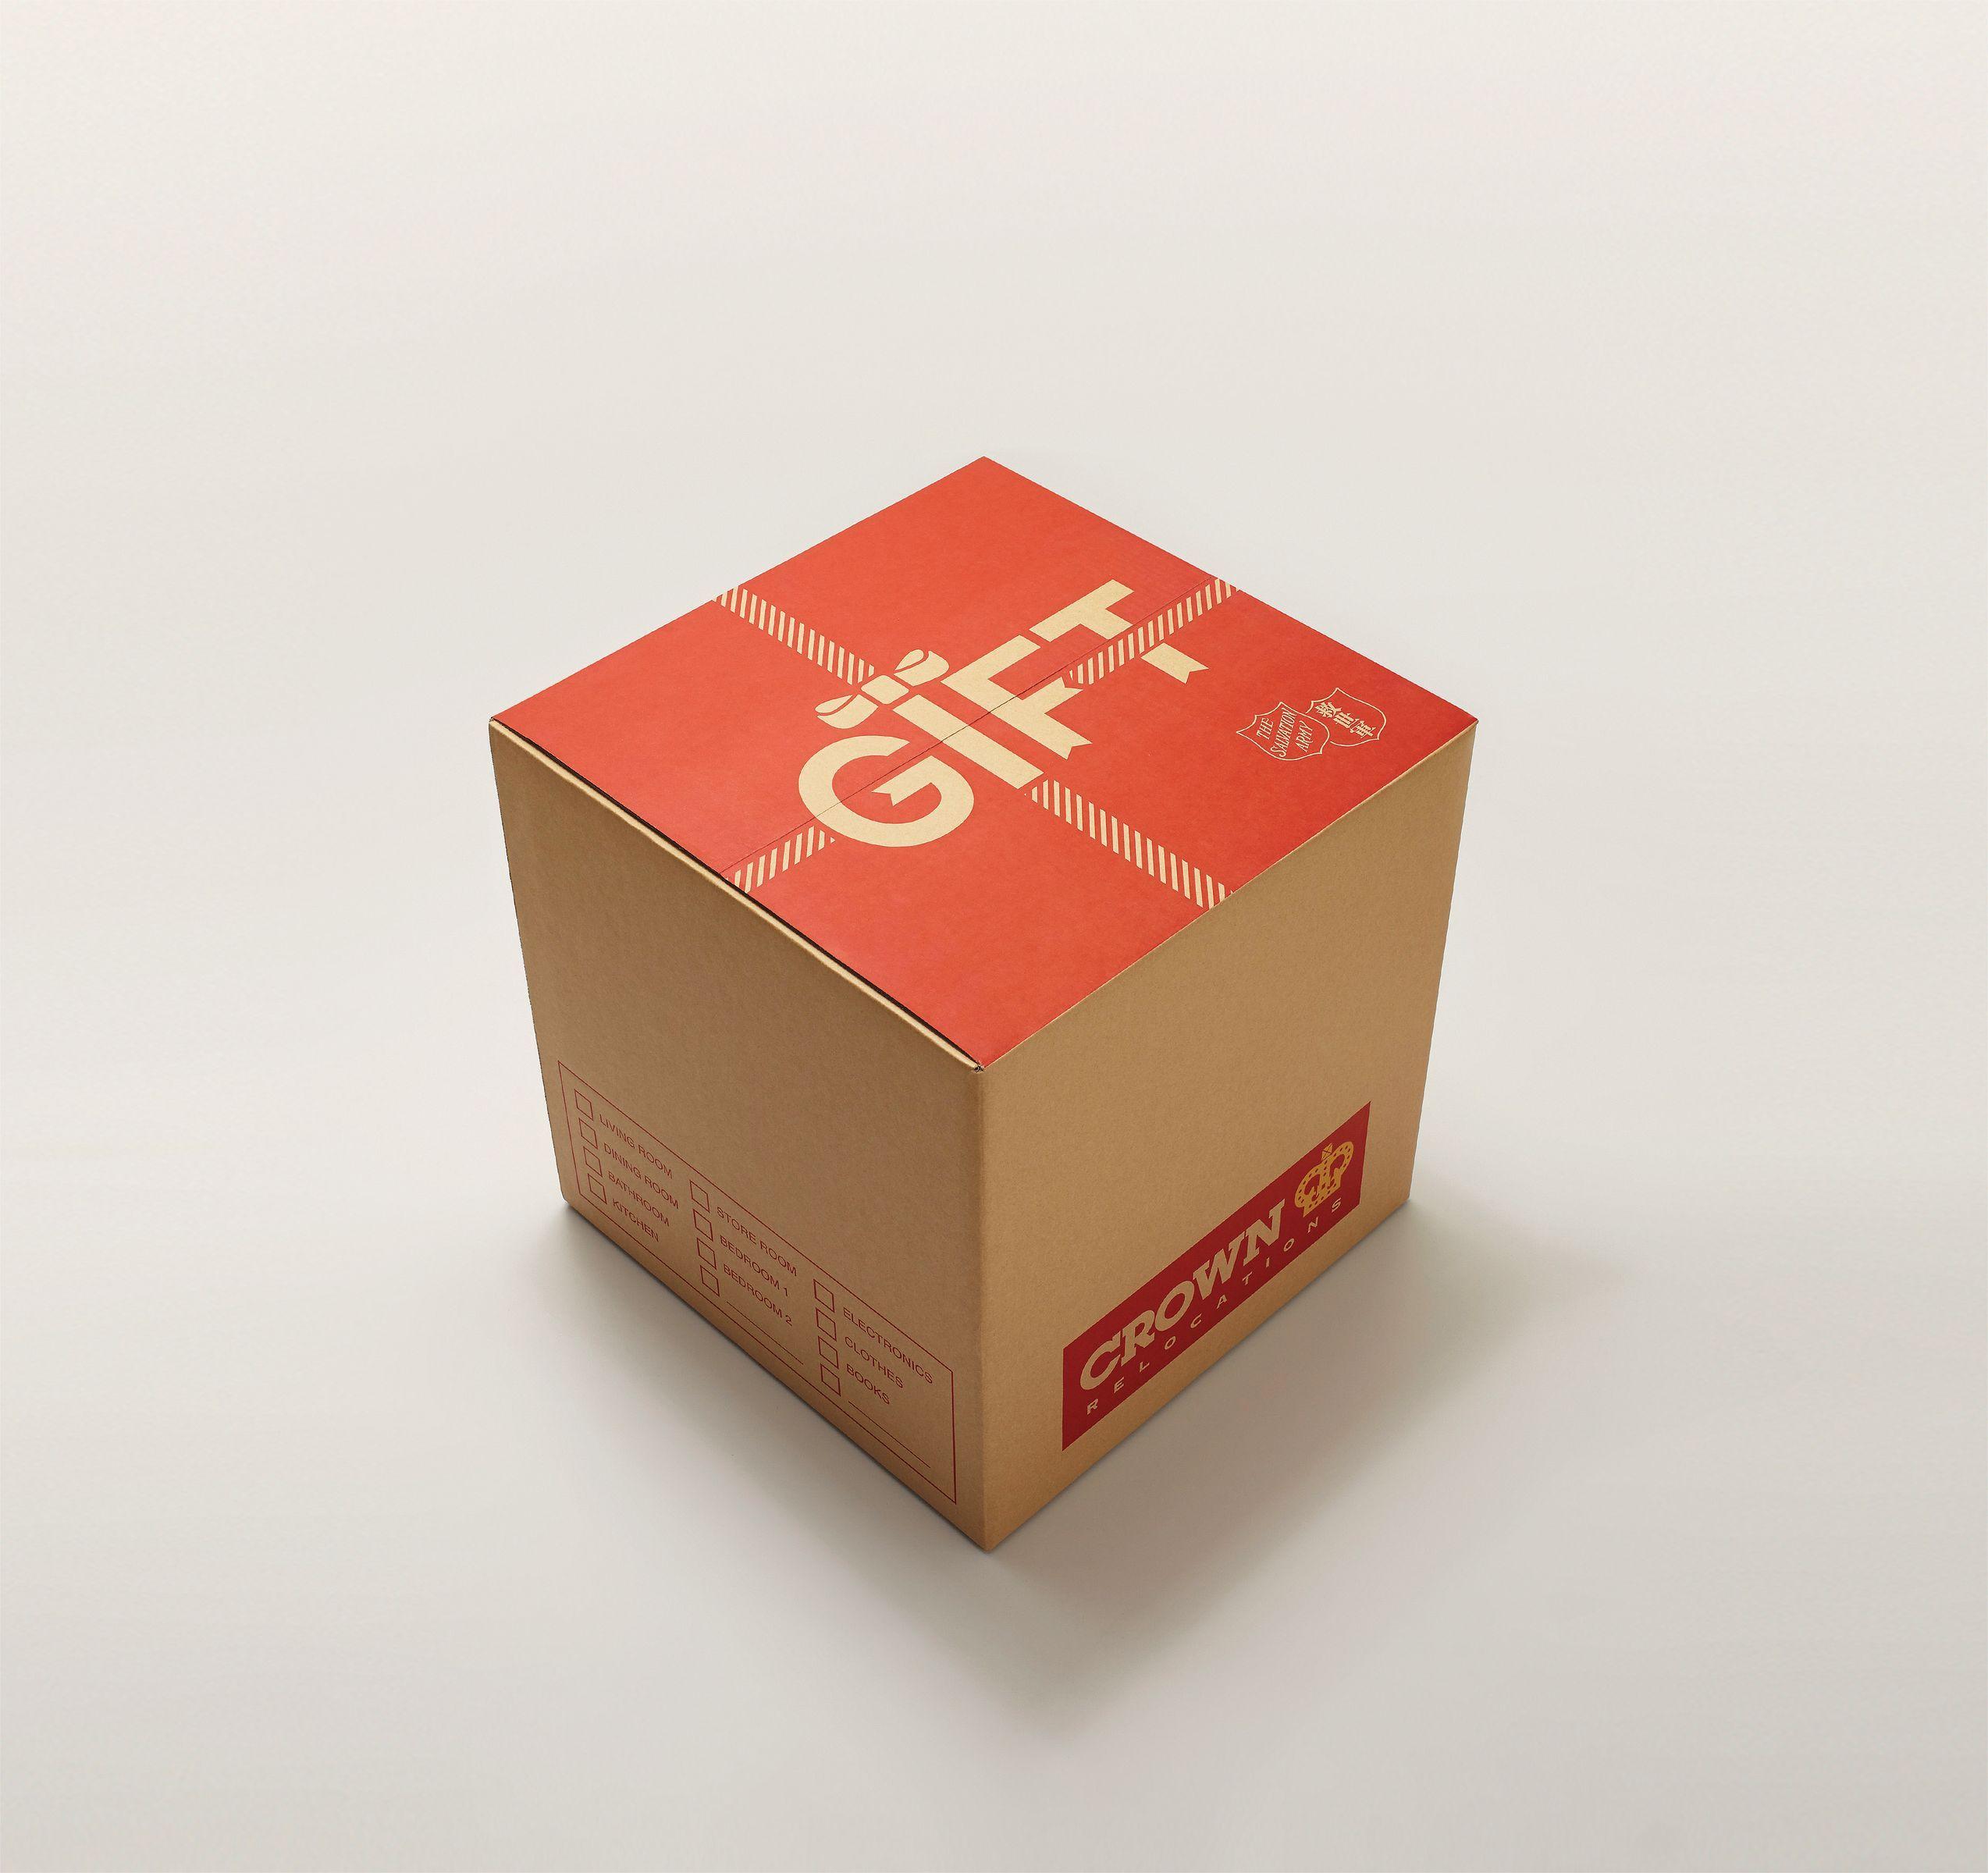 Gift Box Environmental Sustainability Design Ideas Award